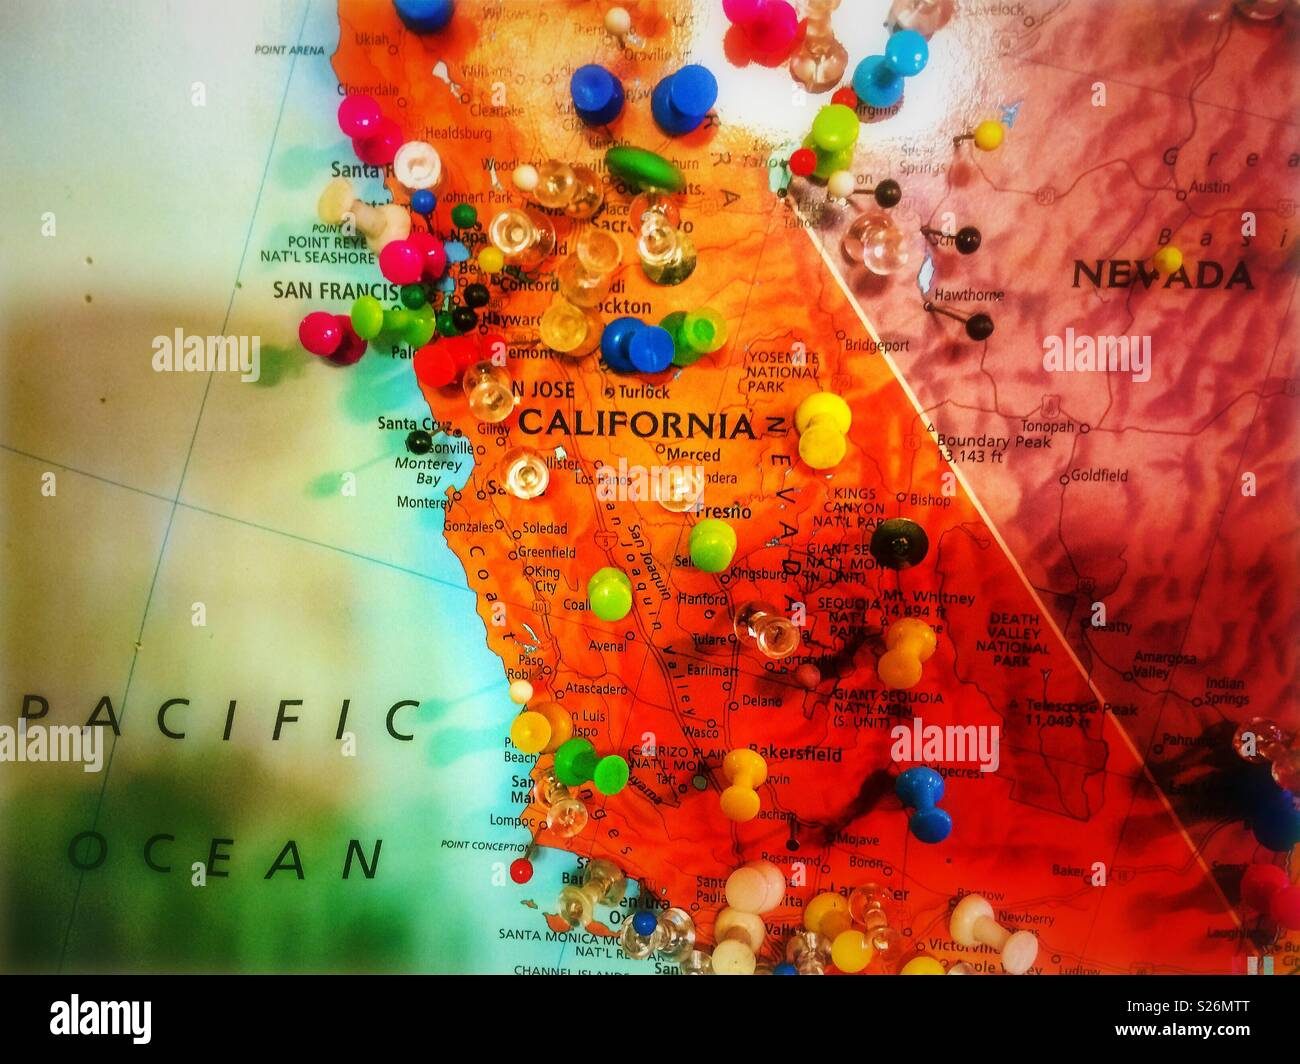 Southwest Usa Map Stock Photos & Southwest Usa Map Stock ...